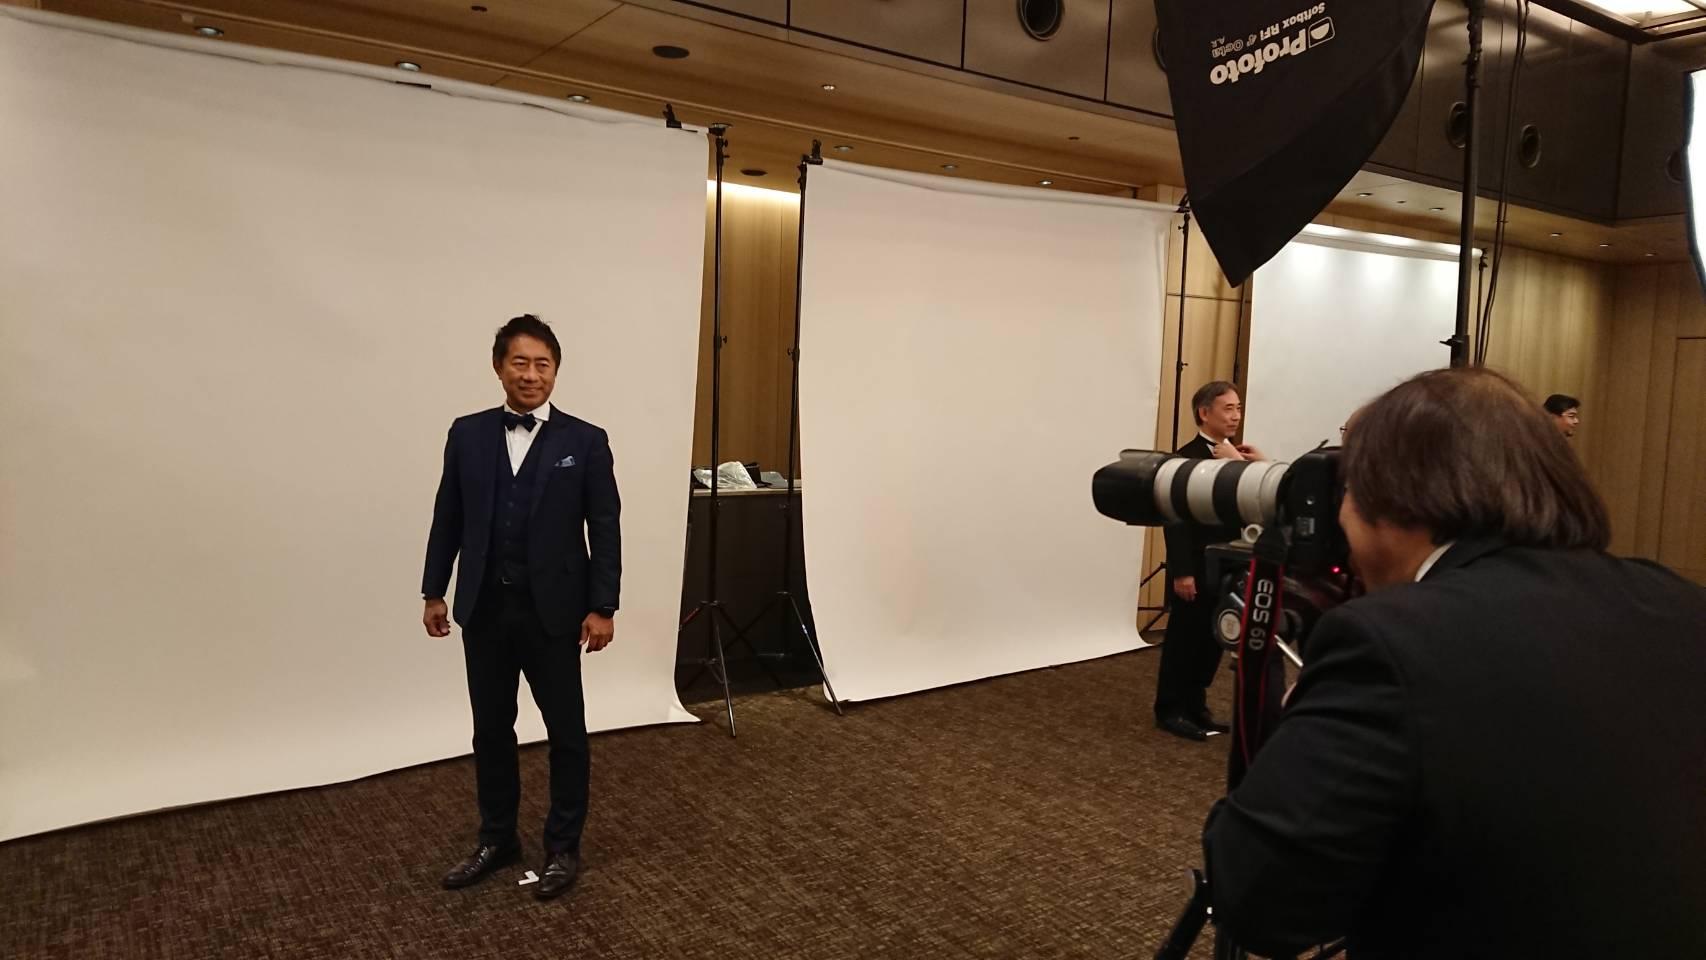 ▲Charming Chairmanとして記念写真撮影中の鈴木!